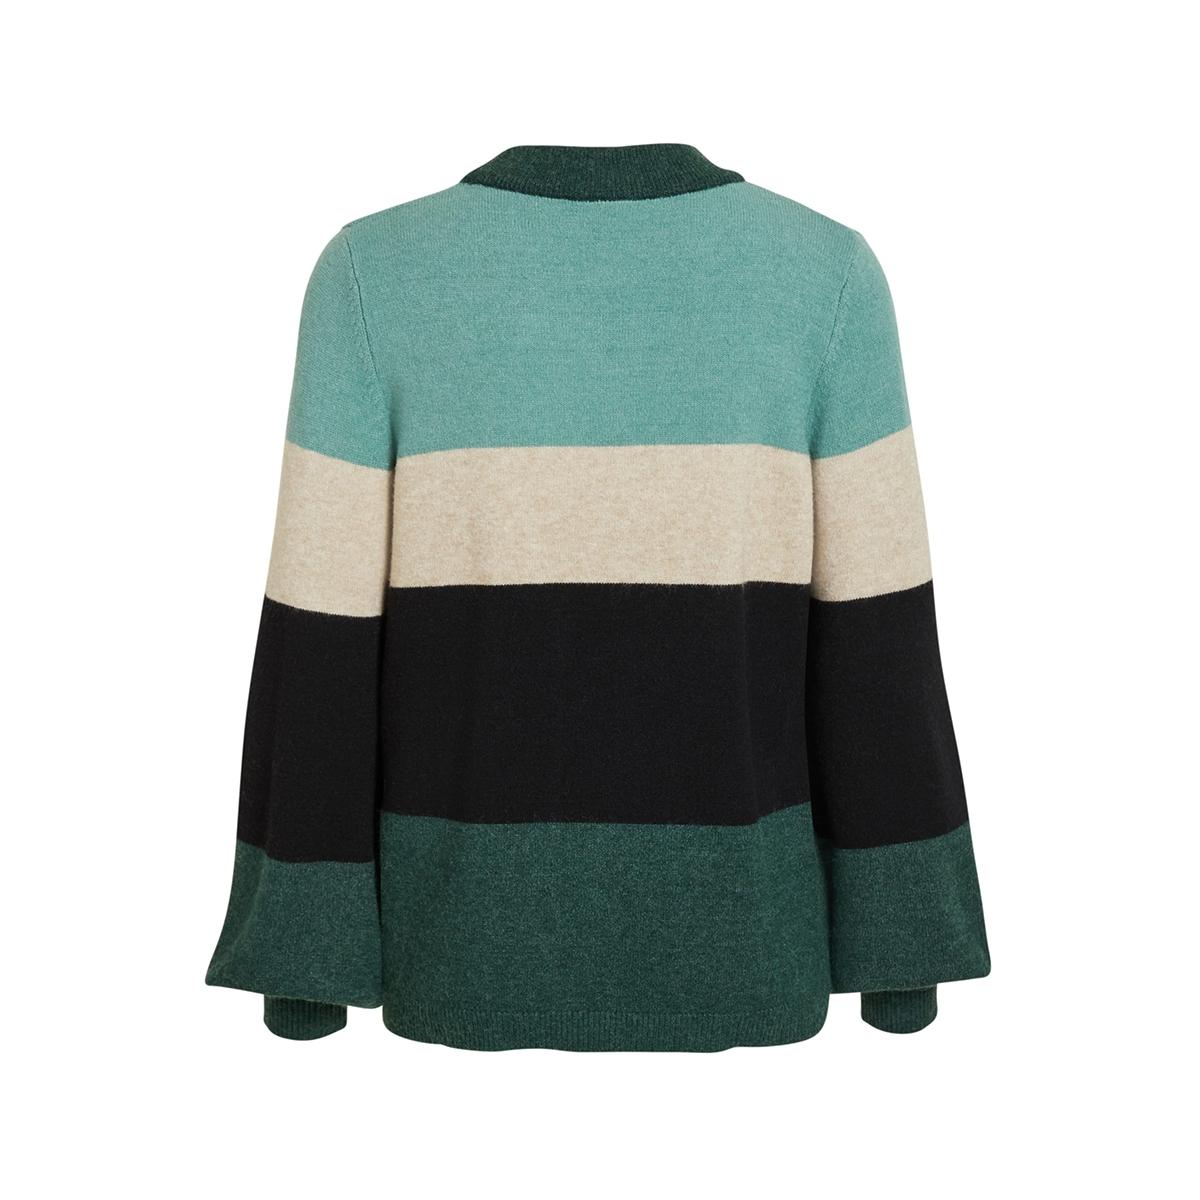 viril l/s balloon block knit top-fa 14055690 vila trui pine grove/combo pine